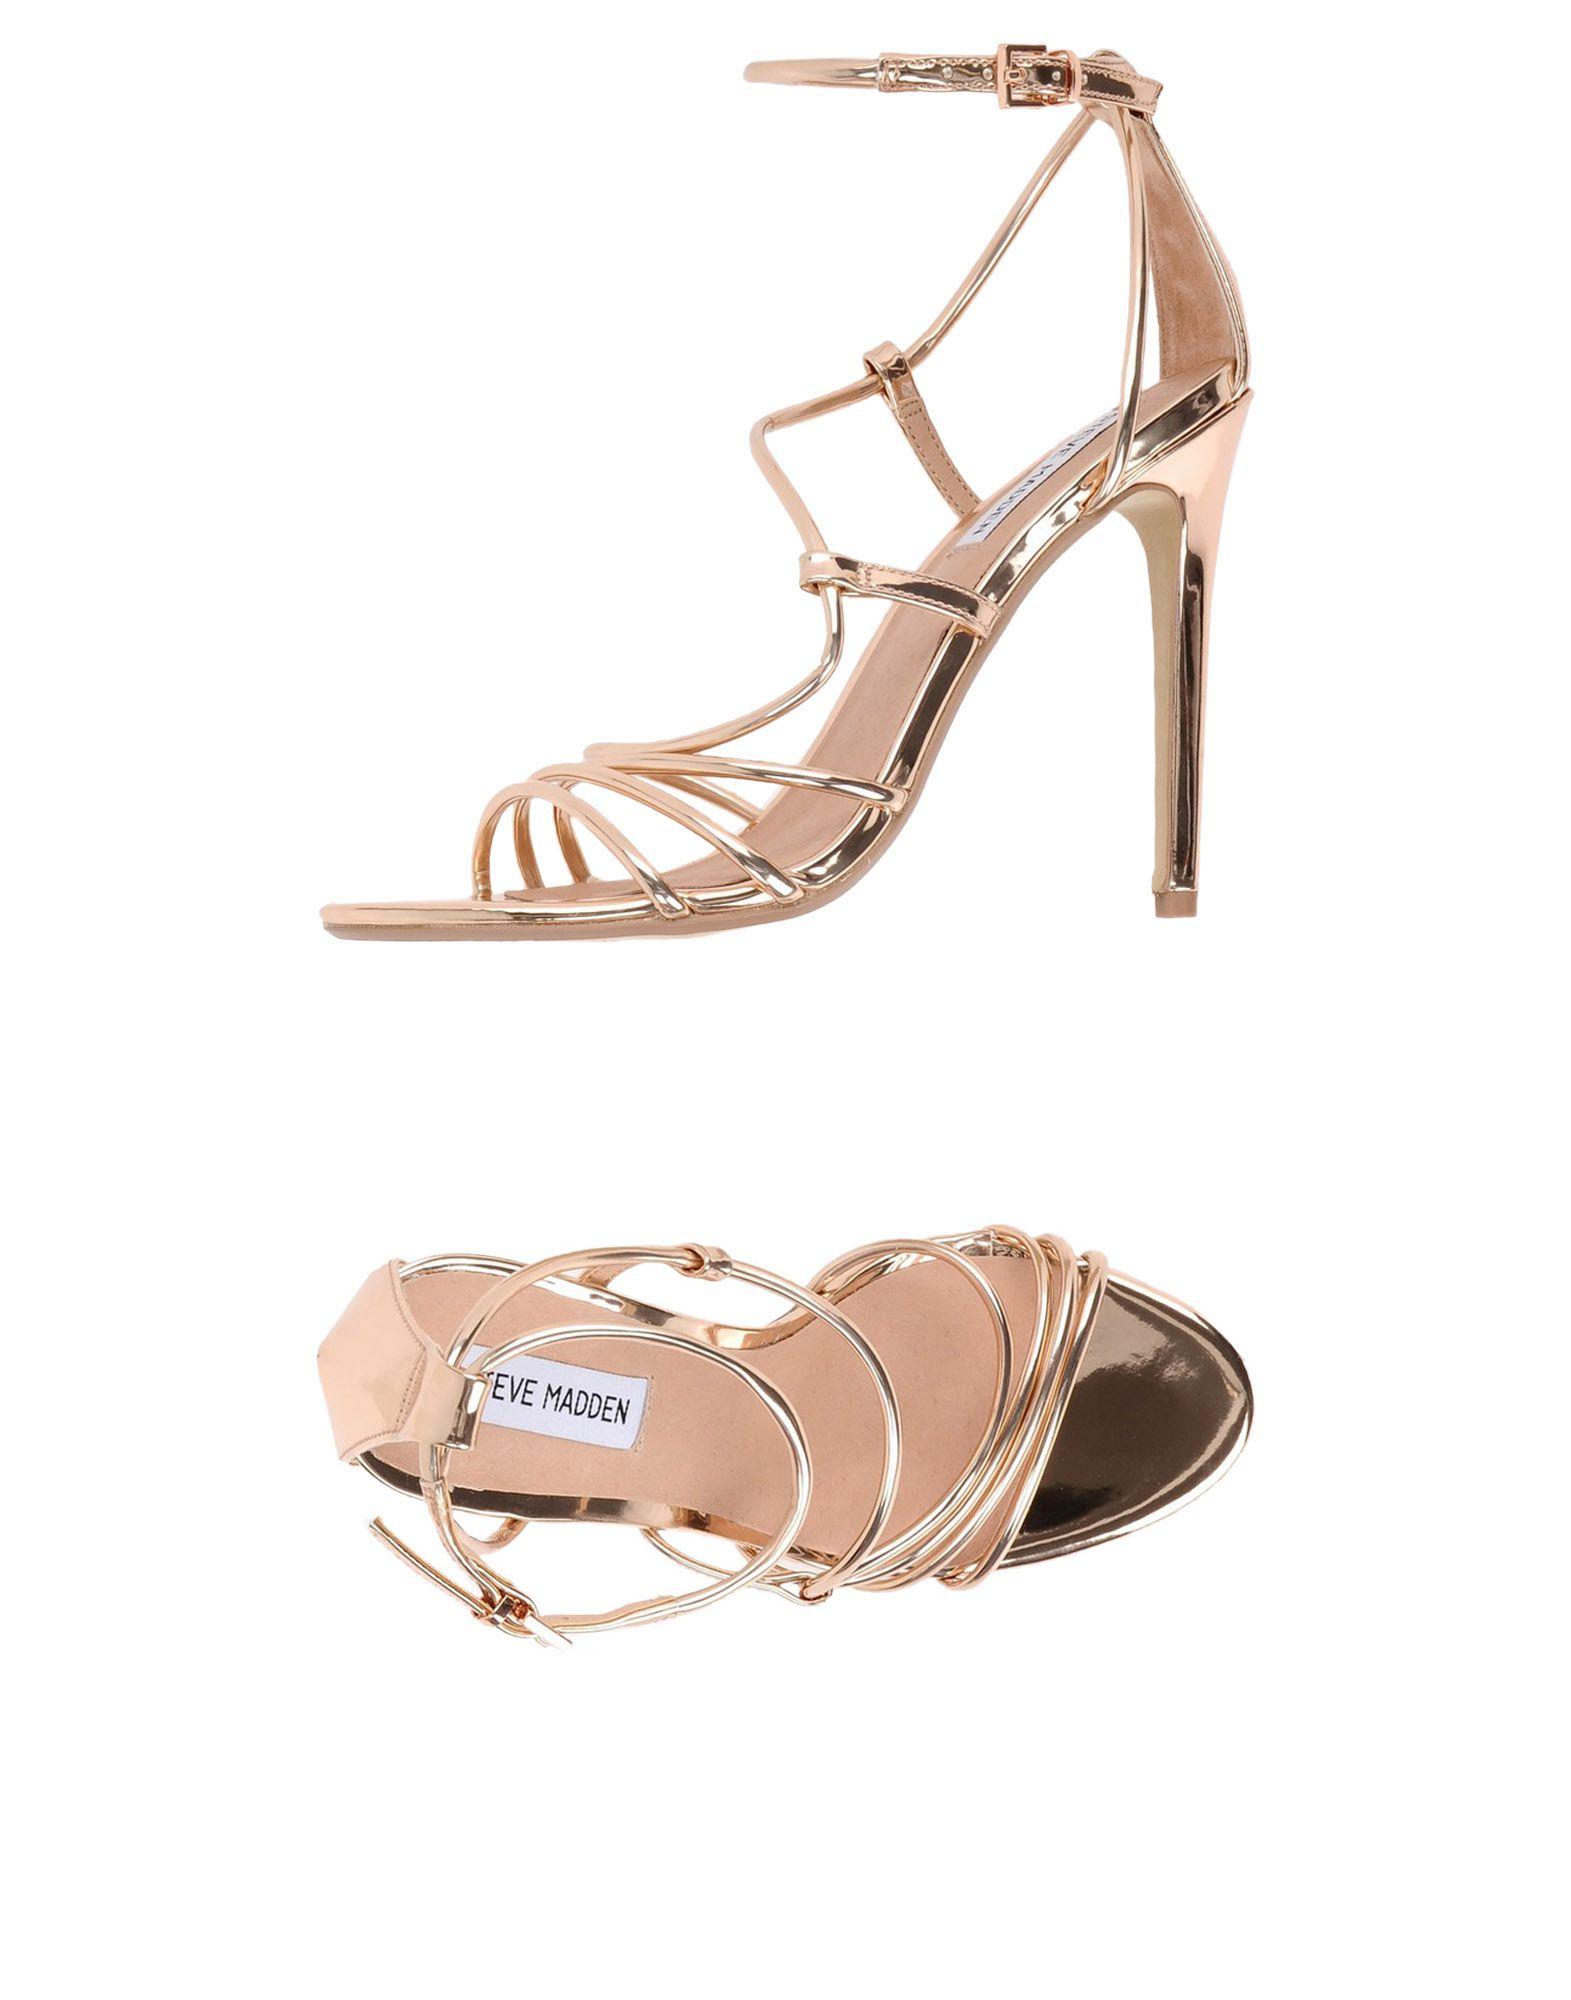 Steve Madden Smith Sandal  11437008AO Gute Qualität beliebte Schuhe